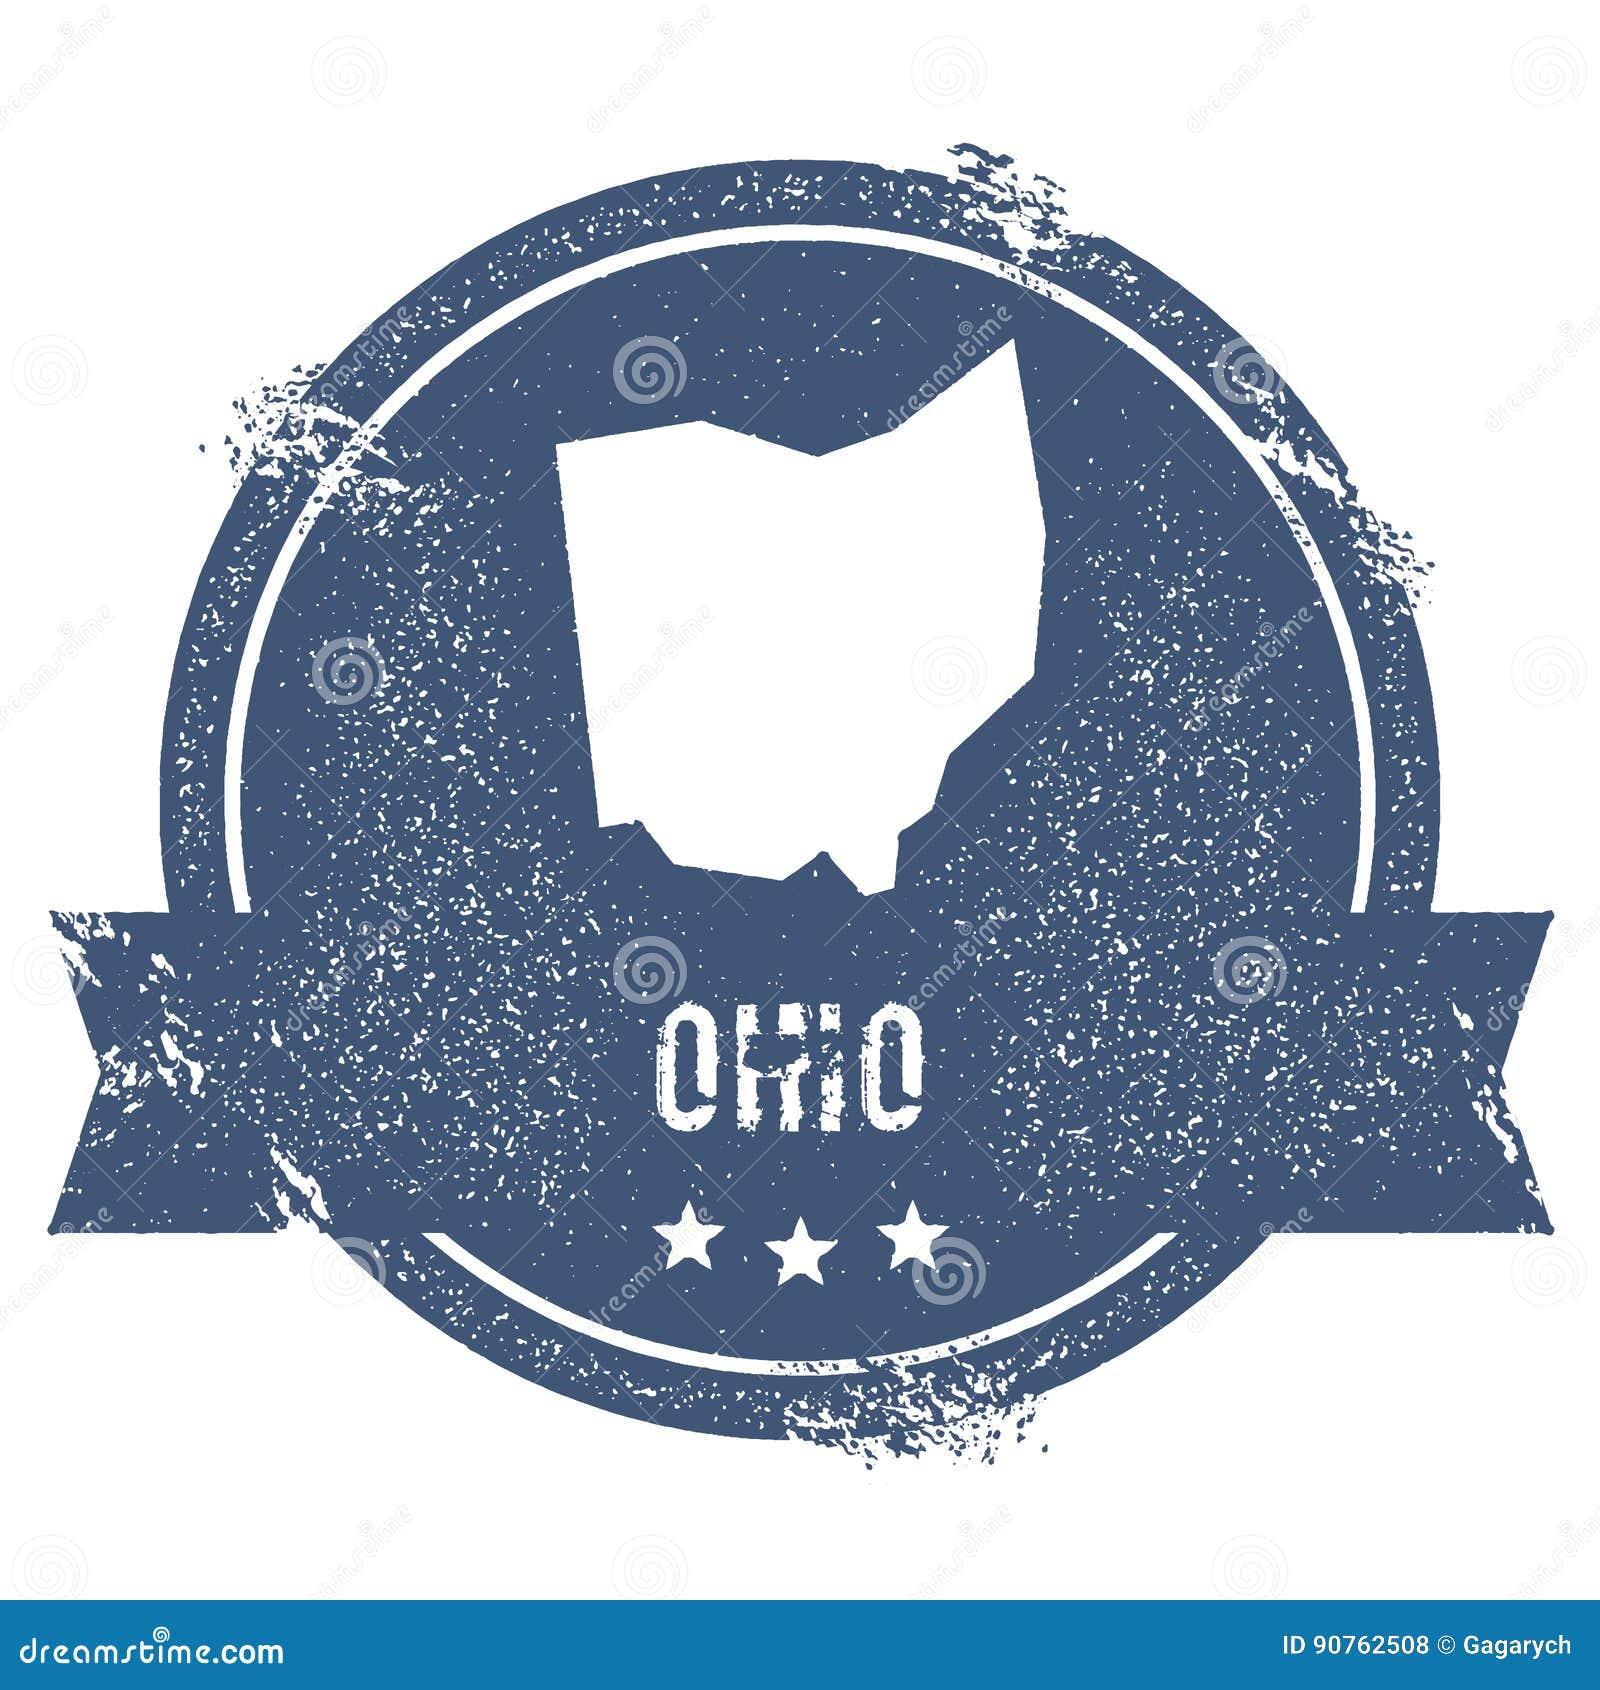 Ohio ocena